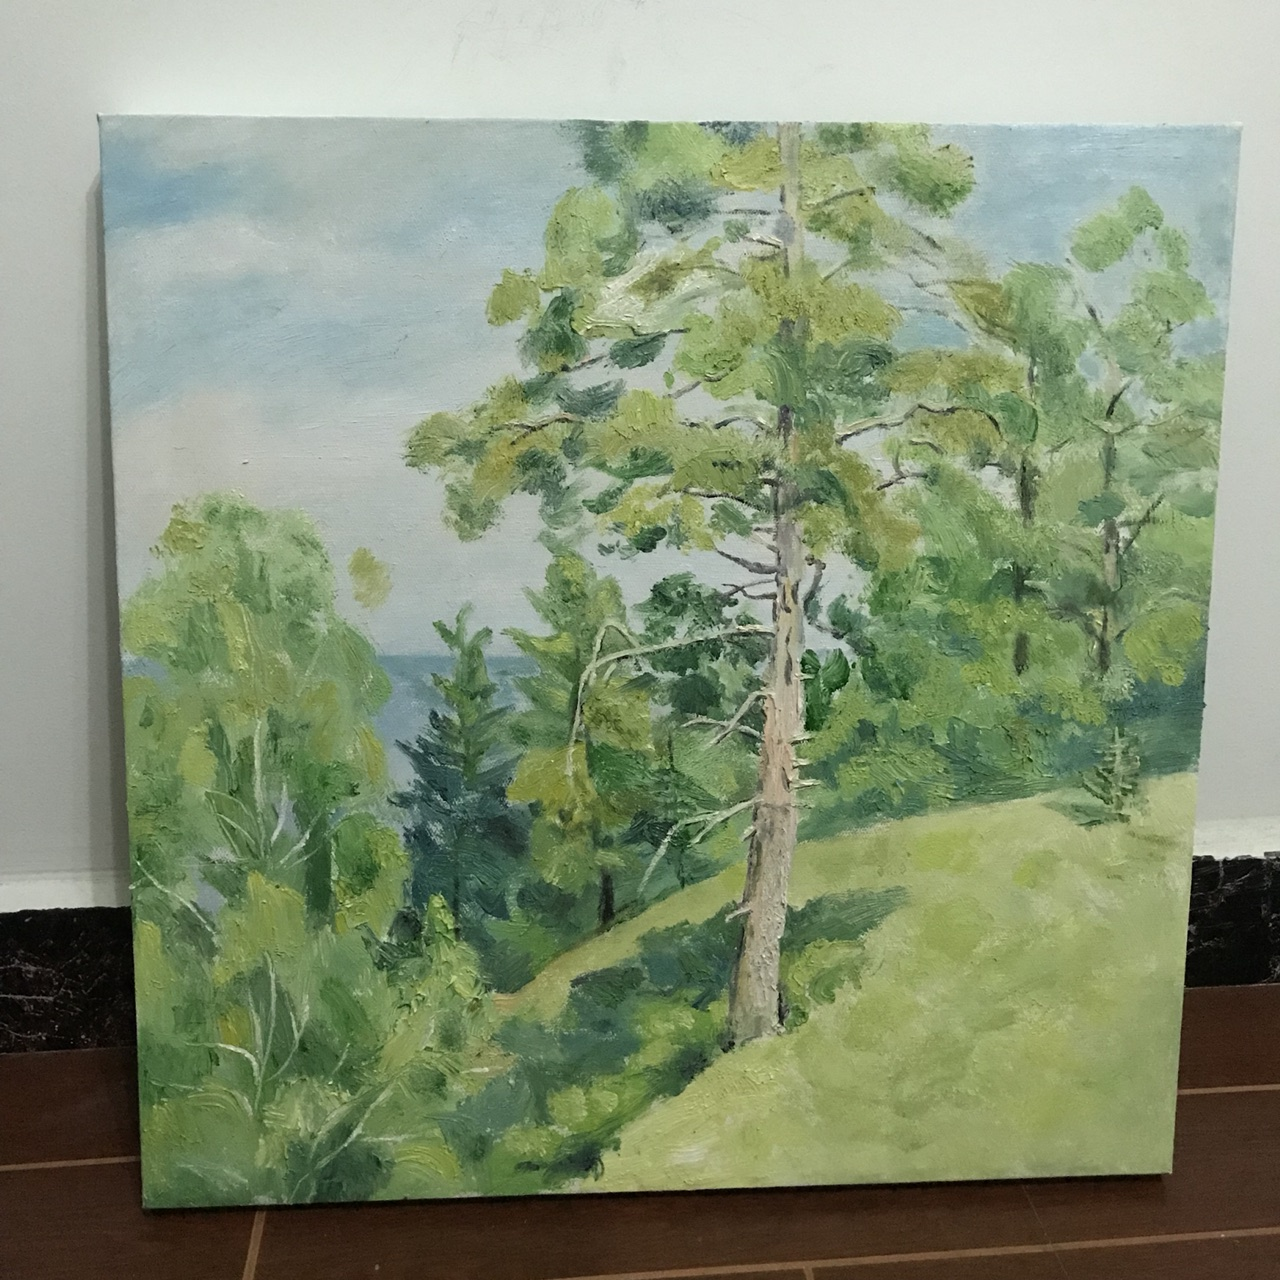 50cm×50cm,纯手绘装饰画油画,可订做,同城可送货上门